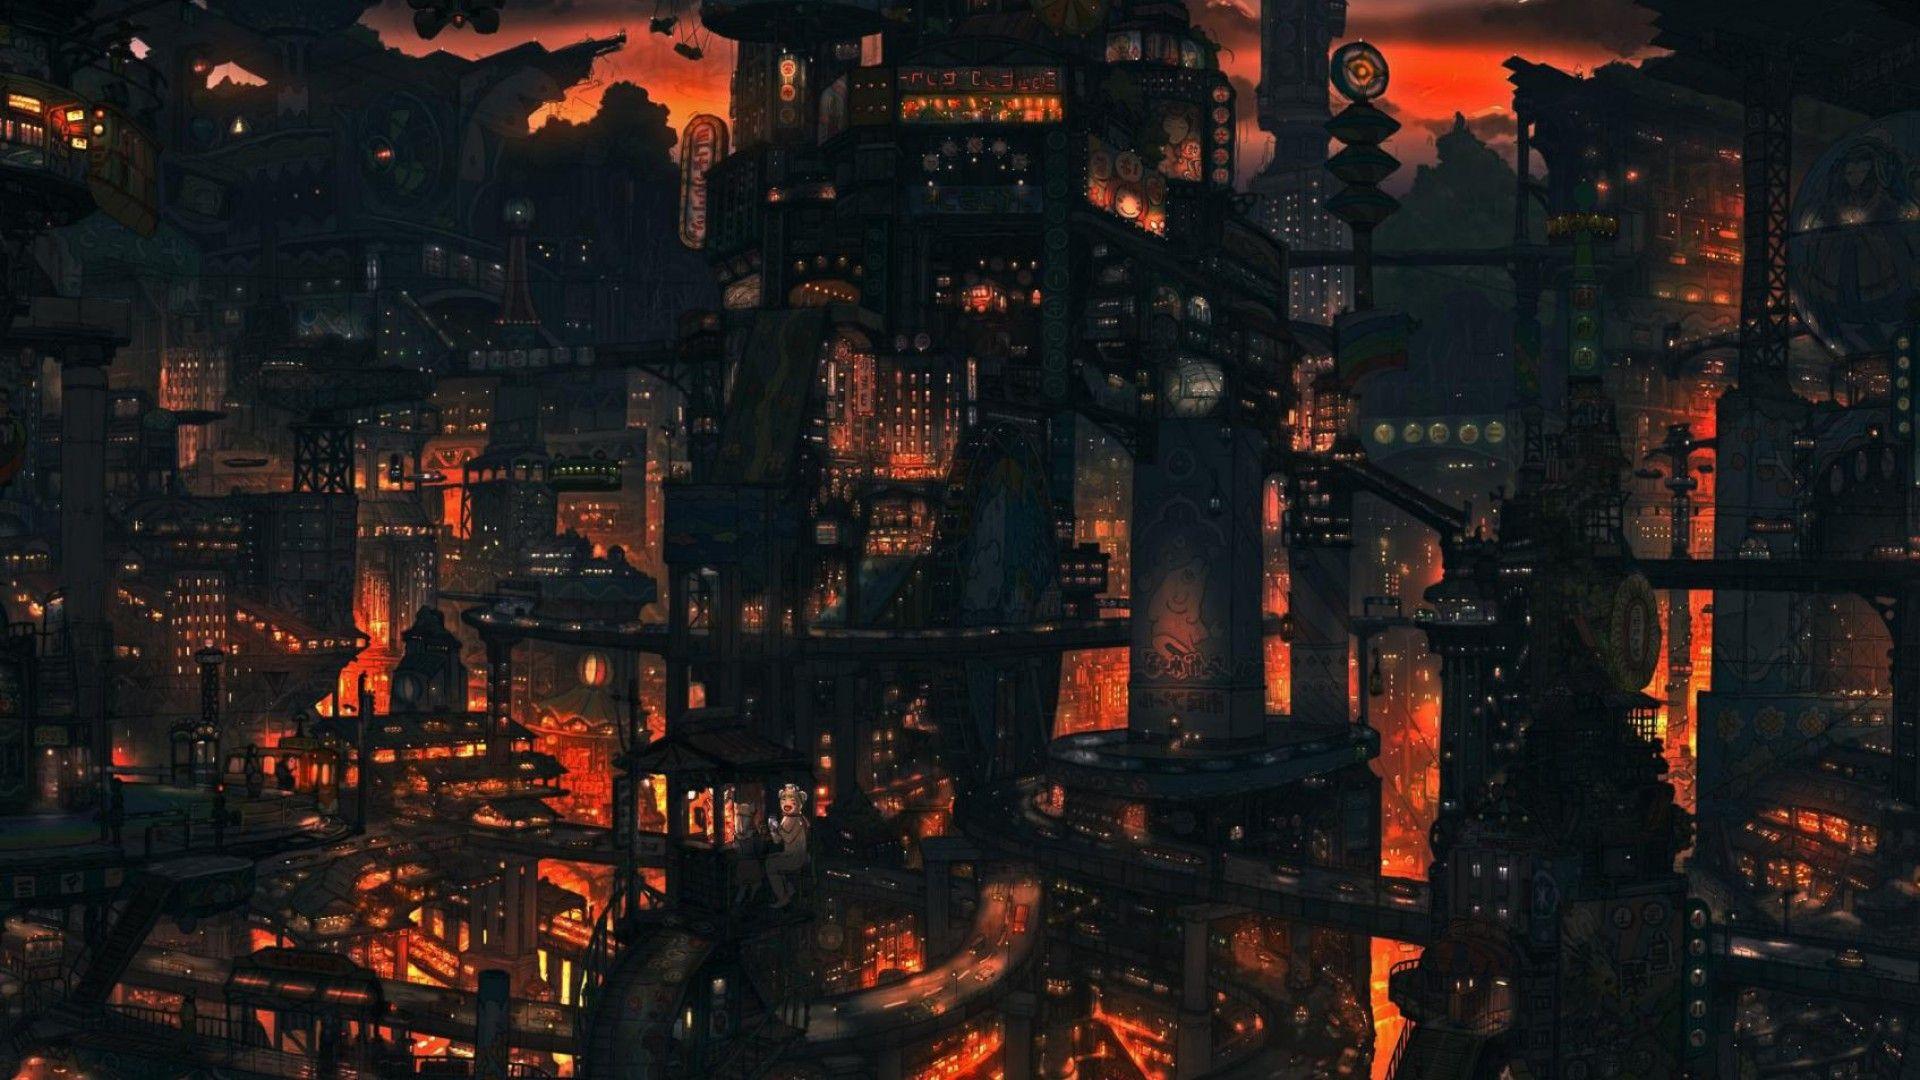 Dark Anime Scenery Wallpaper Background 1 Anime Scenery